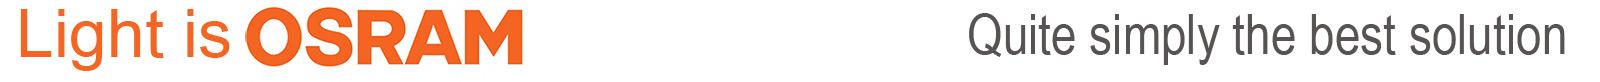 Халогенни крушки H2, H8, H8B, H9, H10, H11B, H13, H15, H16 OSRAM – Халогенни лампи за фарове